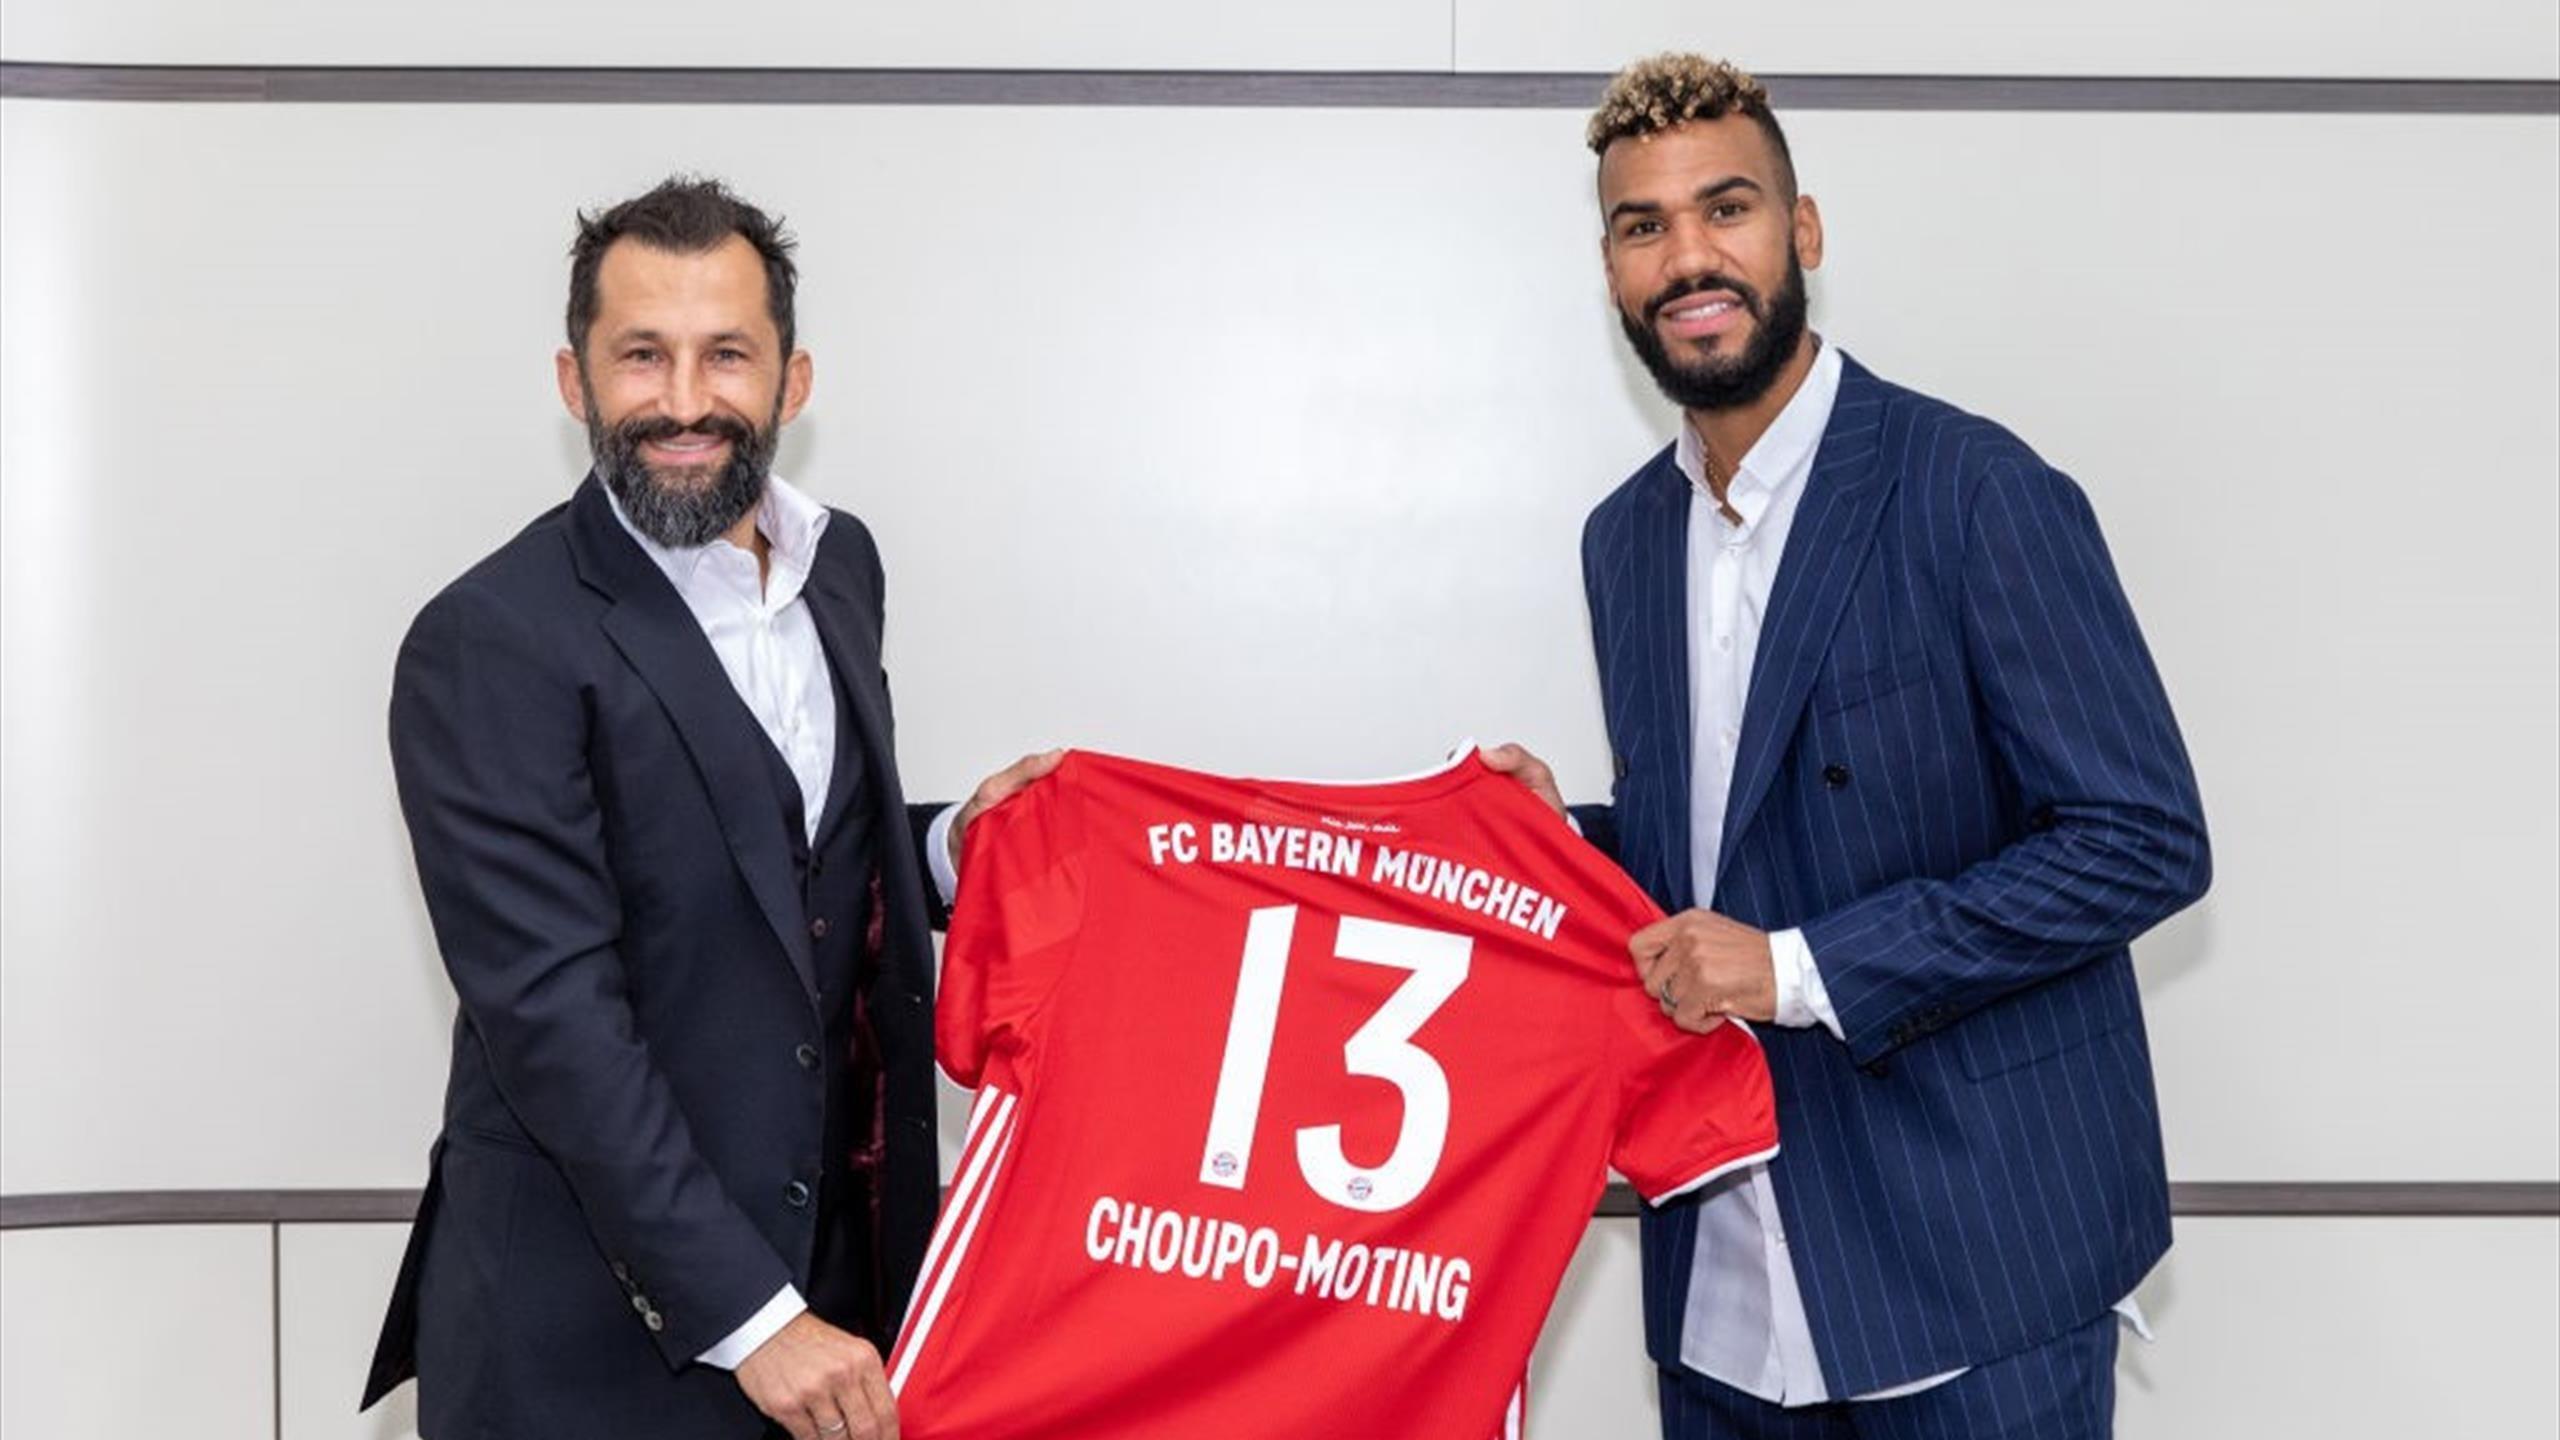 Cameroon forward Choupo-Moting joins Bayern Munich - Sports Leo